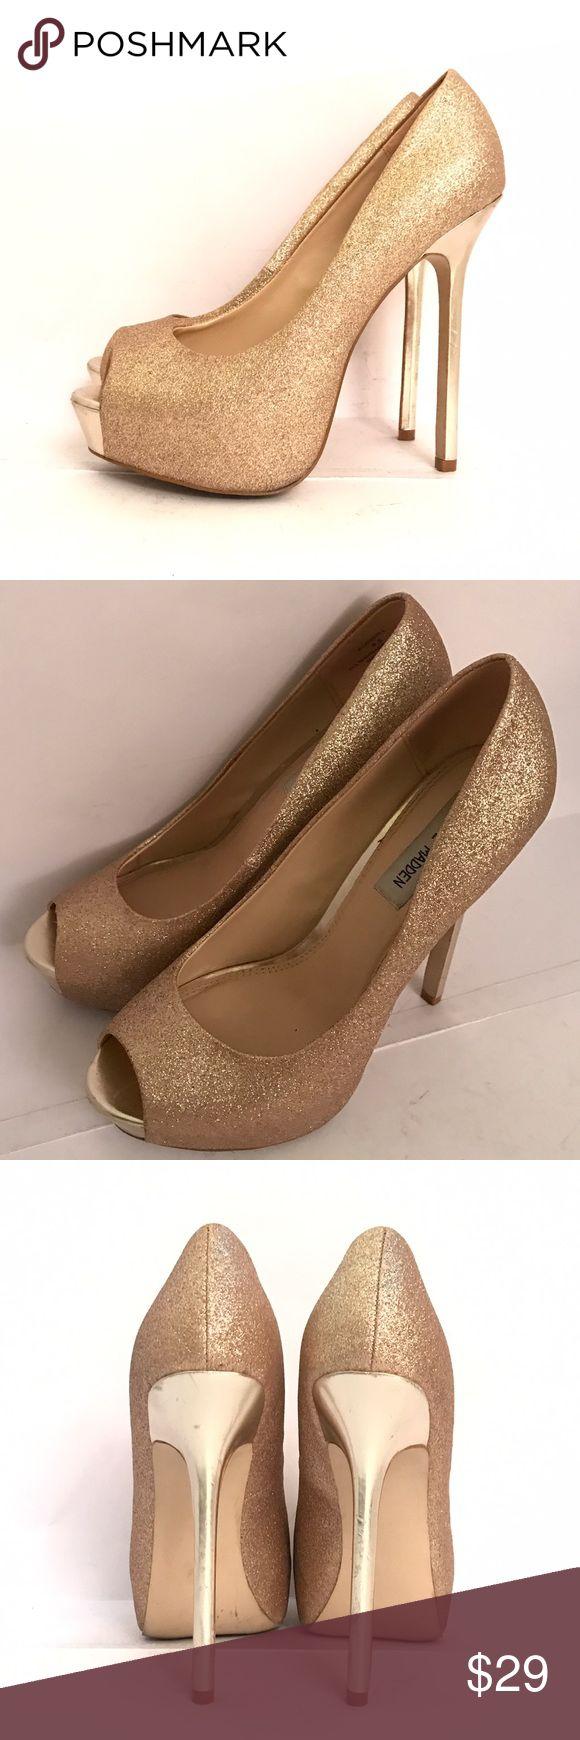 "Steve Madden Platform Gold Glitter Pumps Super pretty champagne gold peep toe platform pumps. great condition!!! Heel height 5.5"" size 8.5 Steve Madden Shoes Platforms"